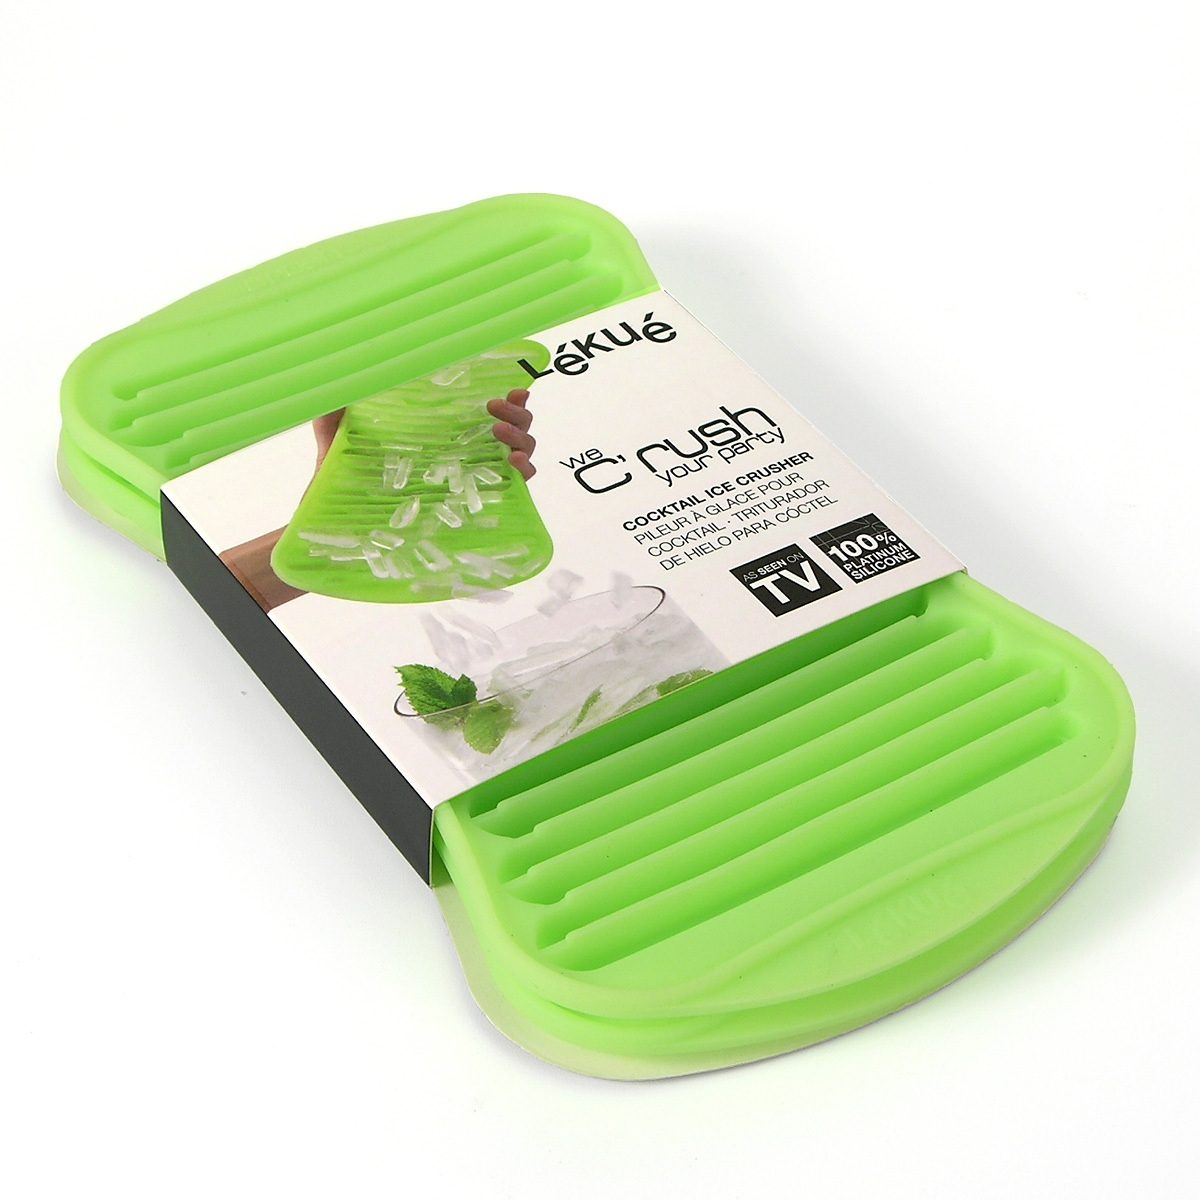 LEKUE Lekue ICE CRUSHER Eiswürfelbereiter grün - 2er Set